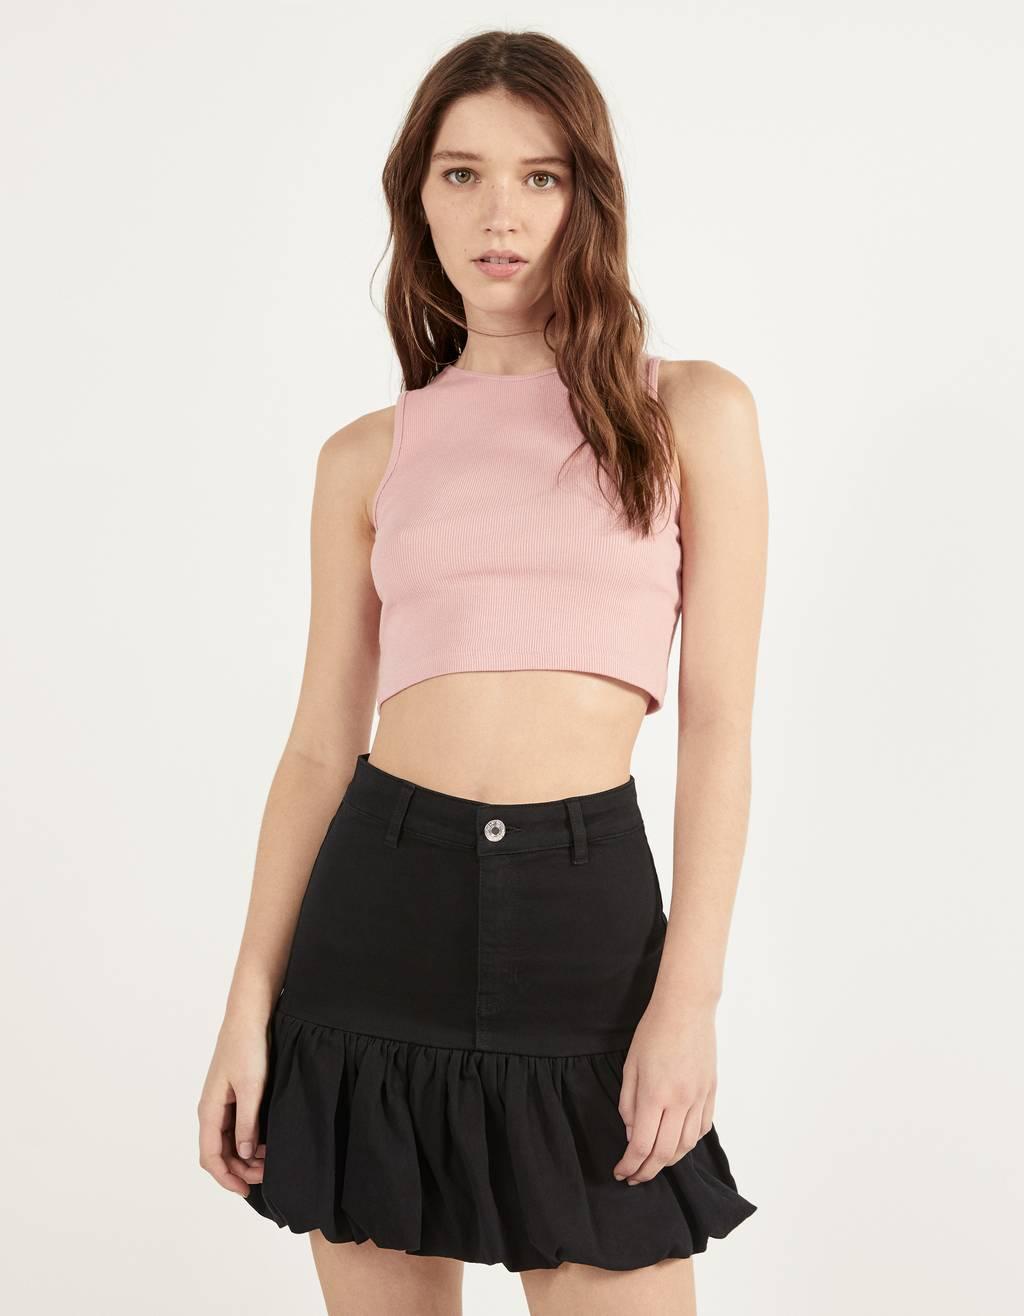 Bubble hem skirt with belt